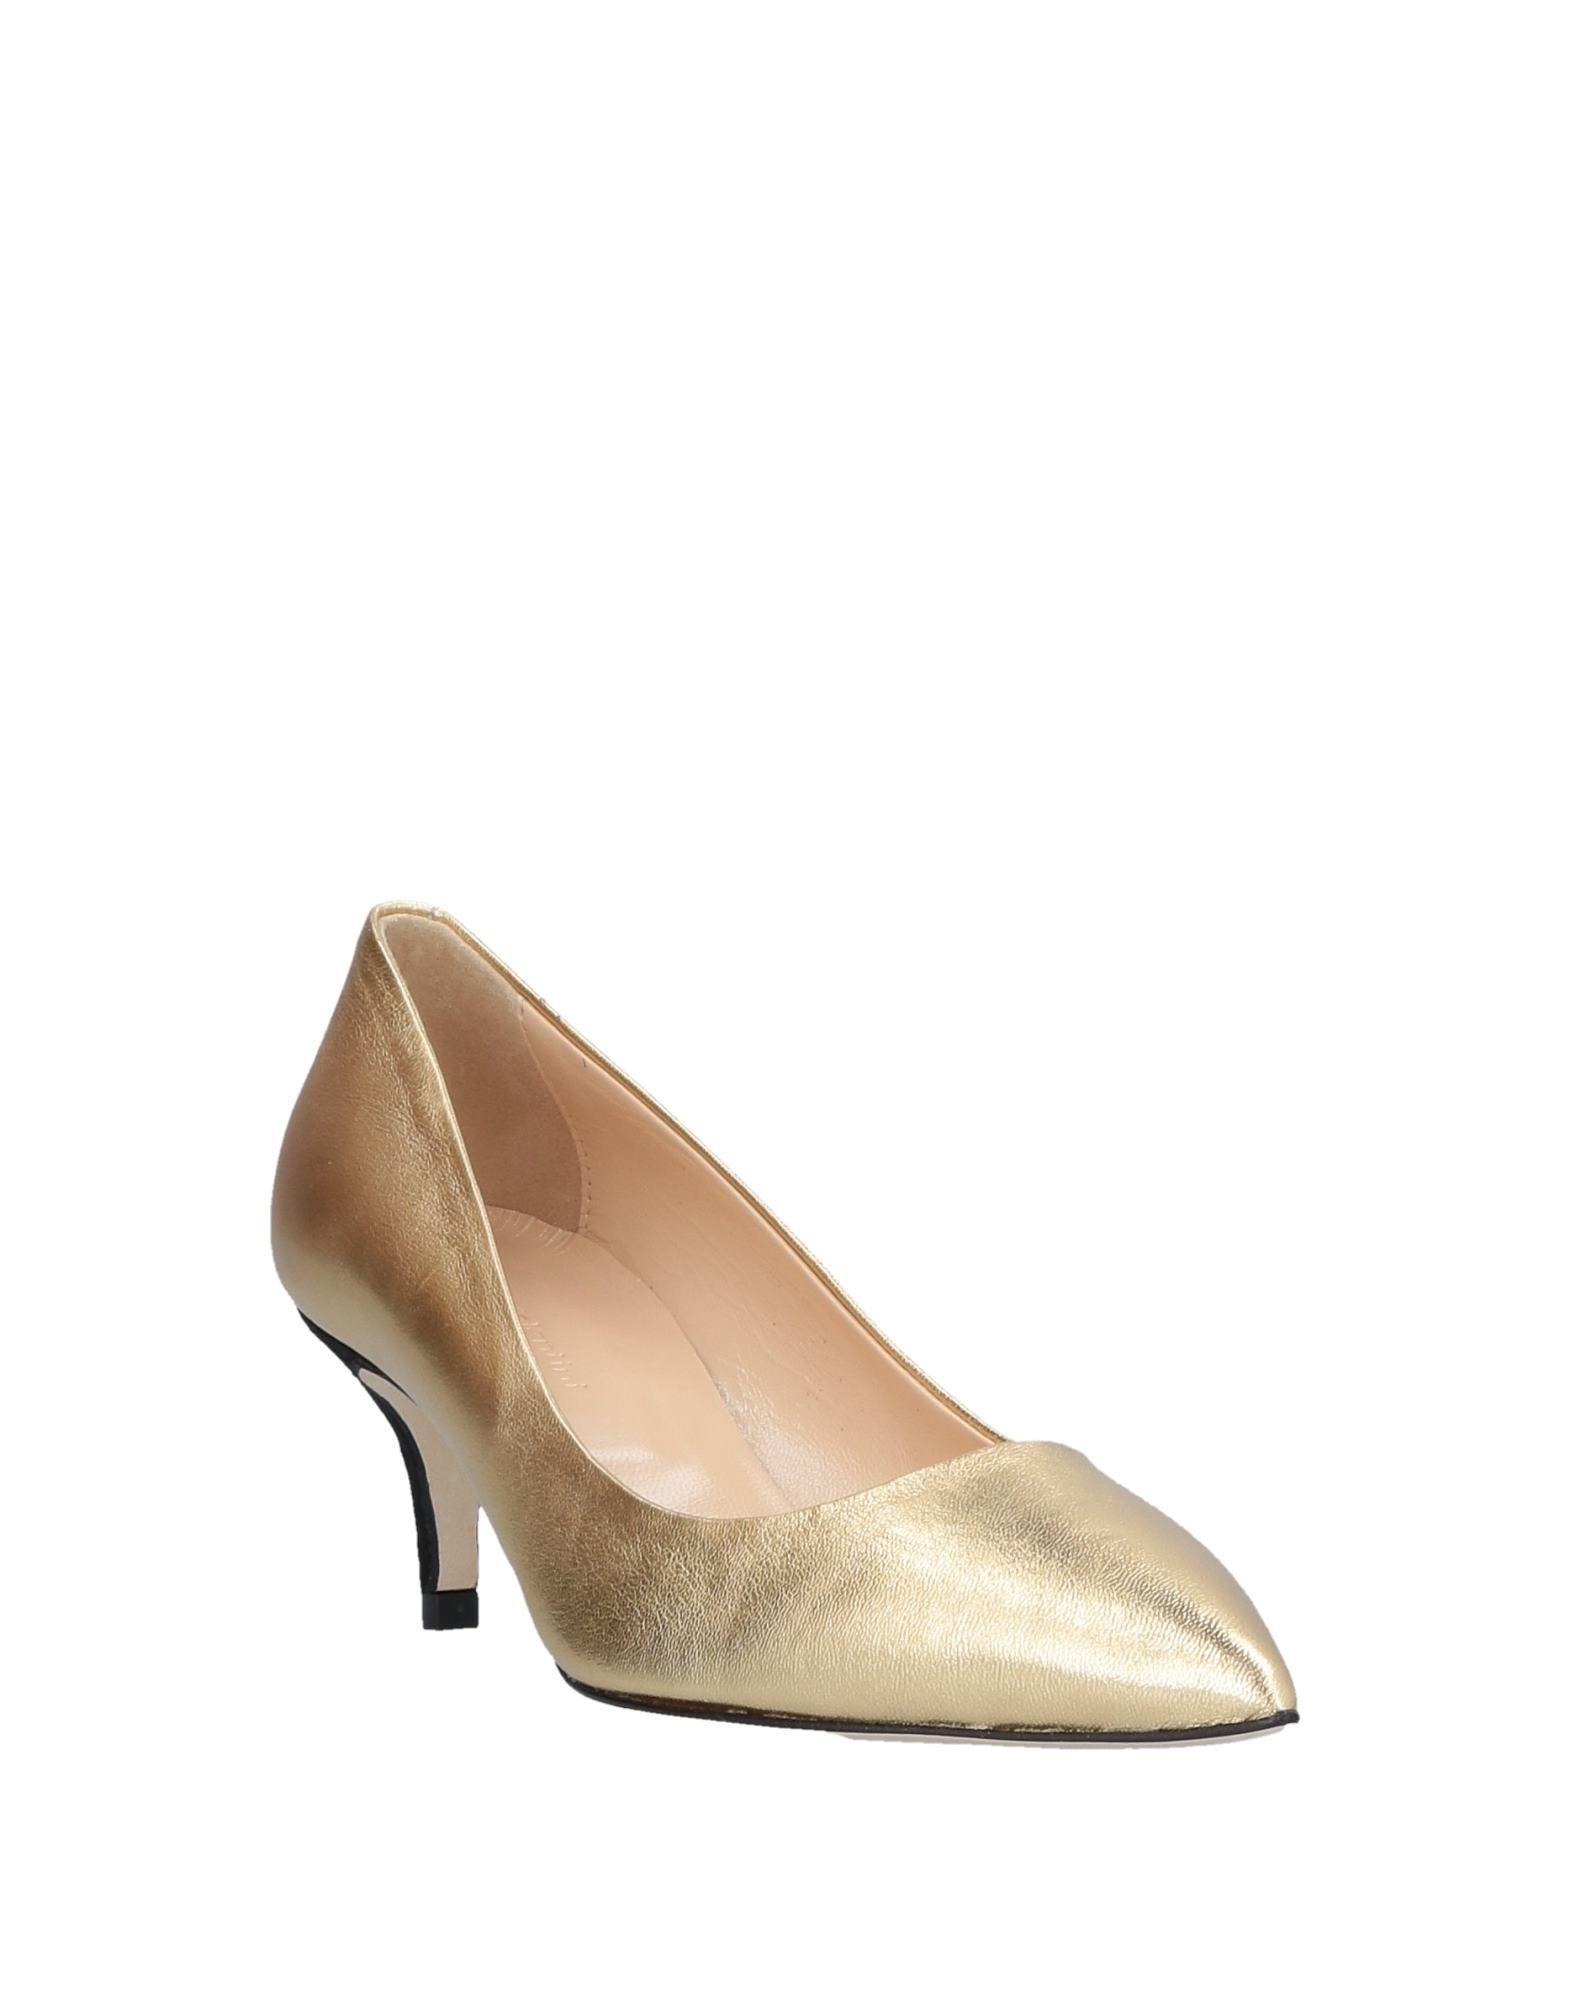 Stilvolle billige Pumps Schuhe Luca Valentini Pumps billige Damen  11536680KT 784166